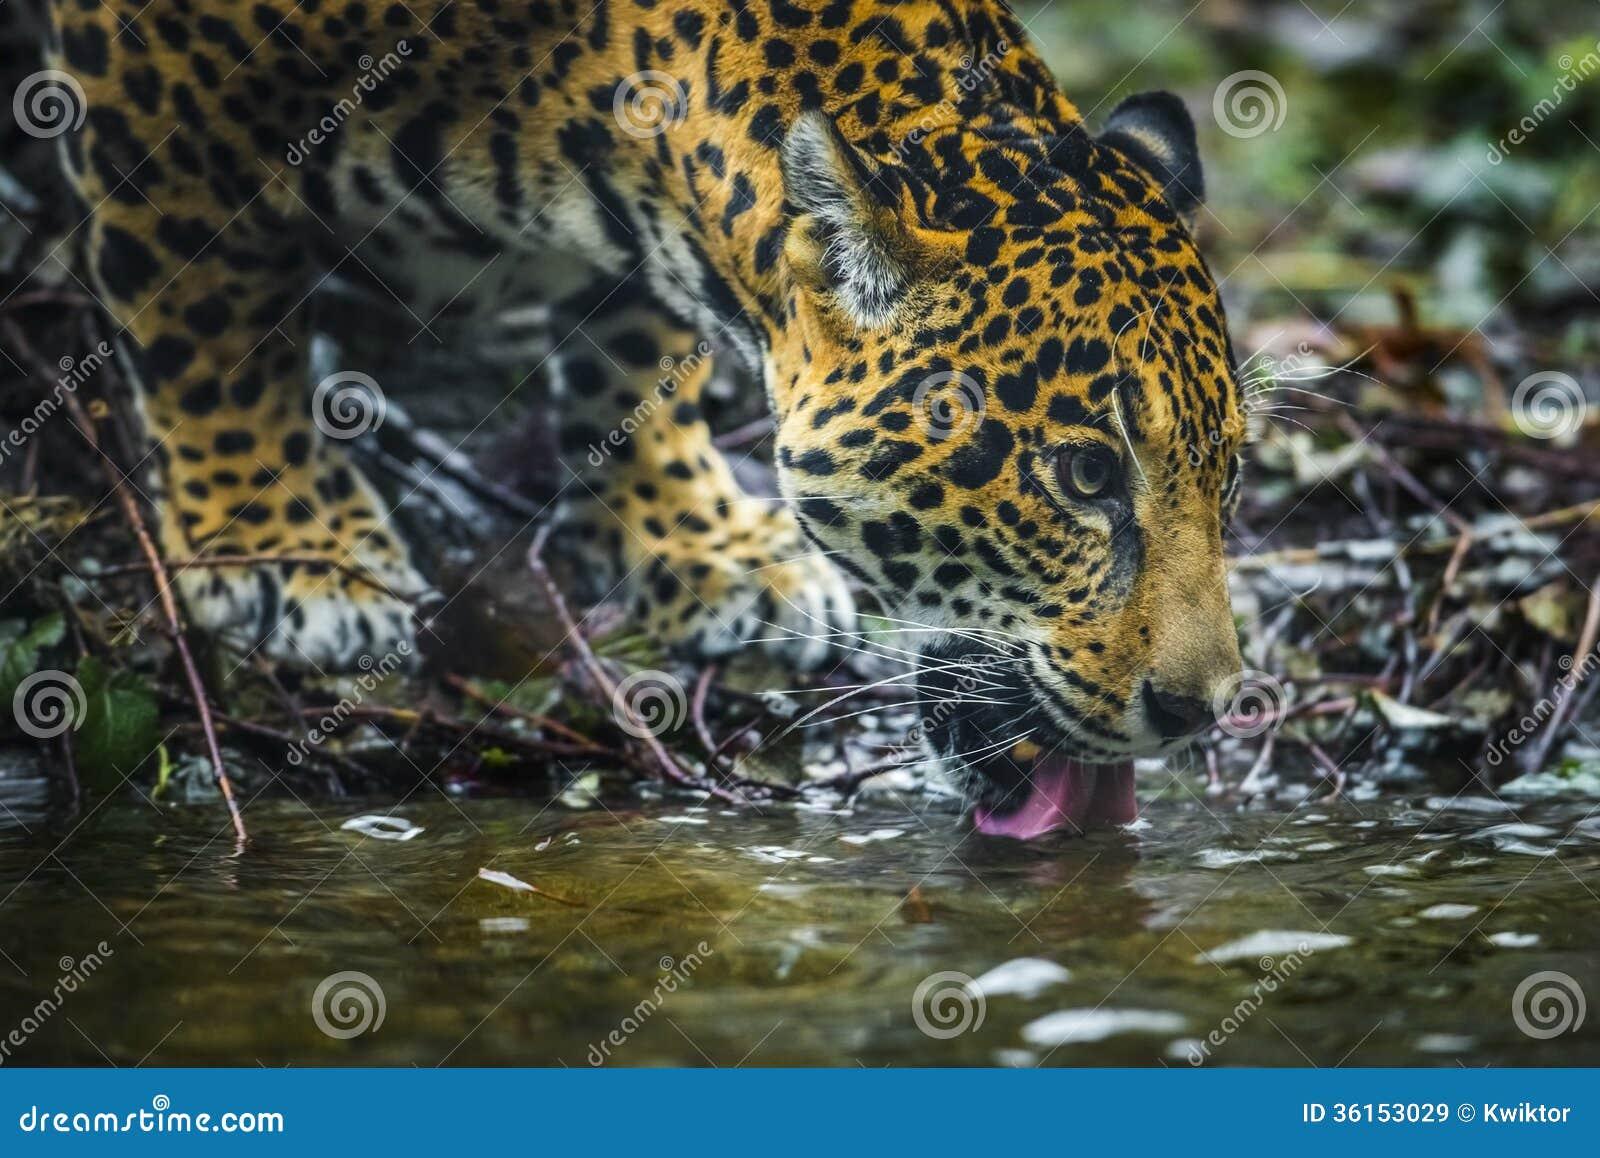 Close Up Animals Drinking Water